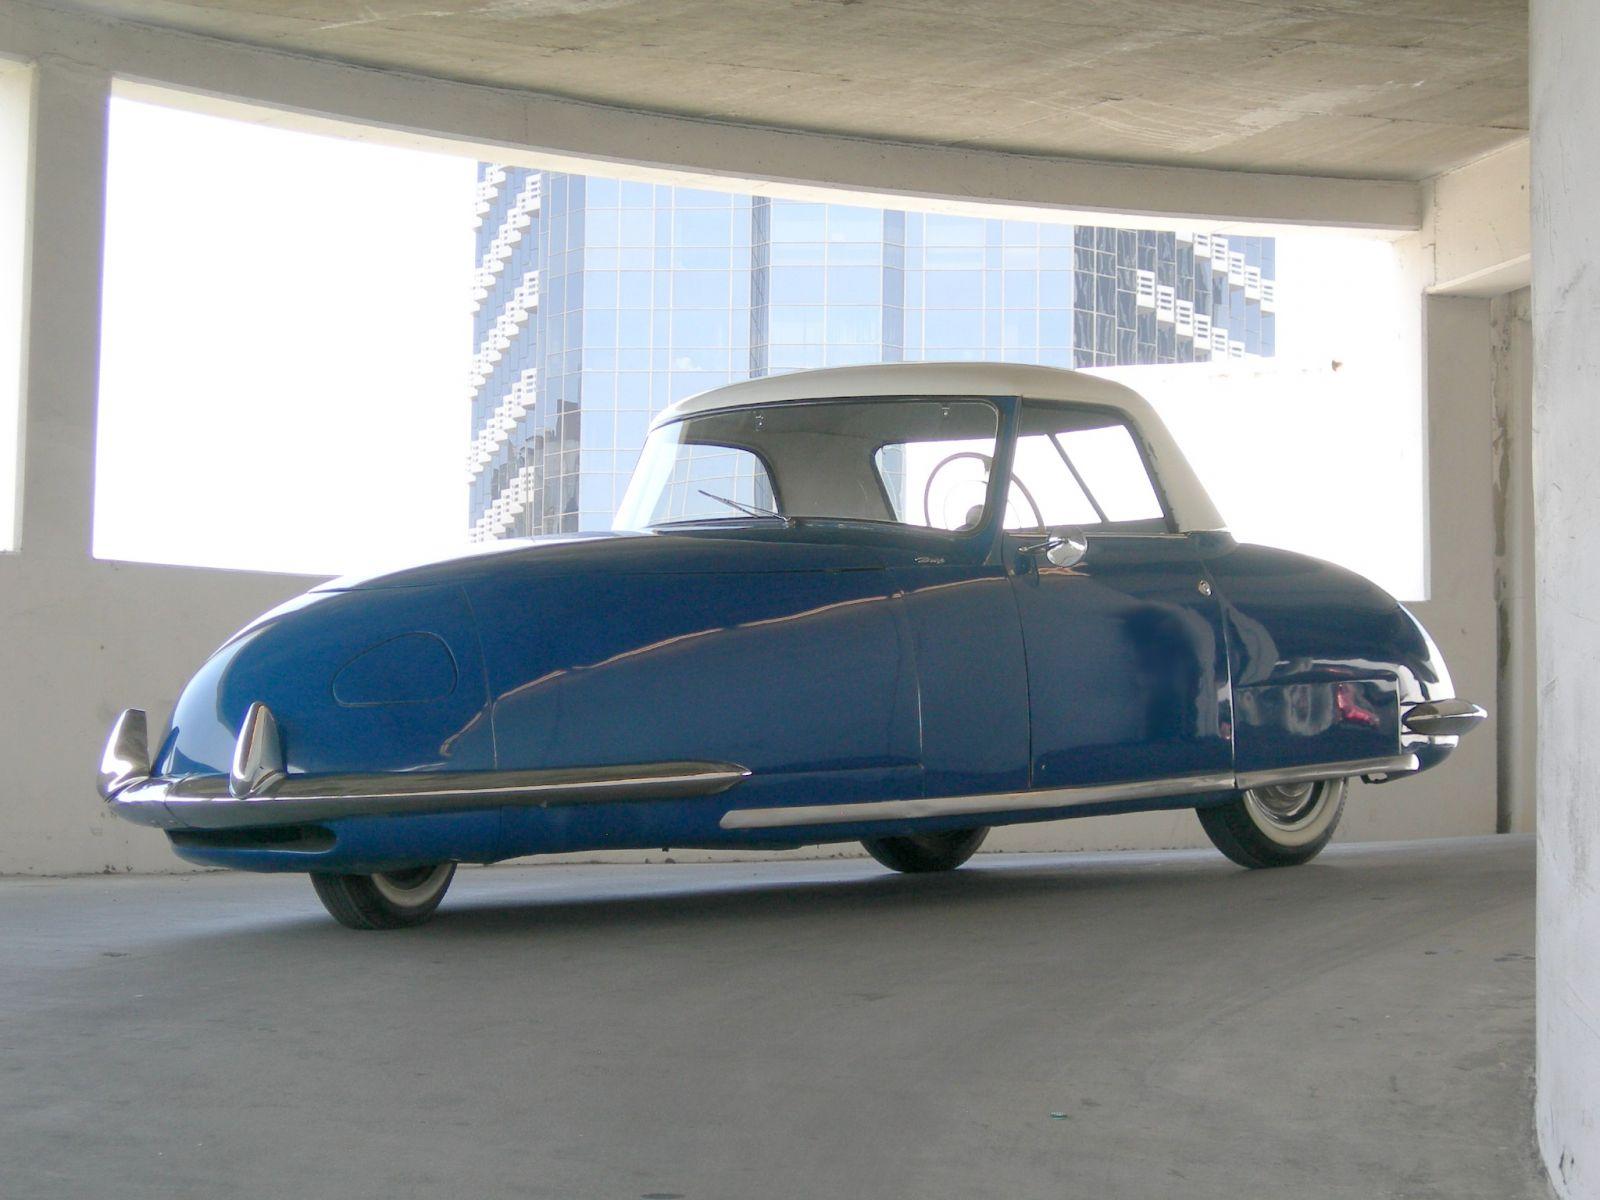 The Petersen Automotive Museum To Restore Ultra-Rare 3